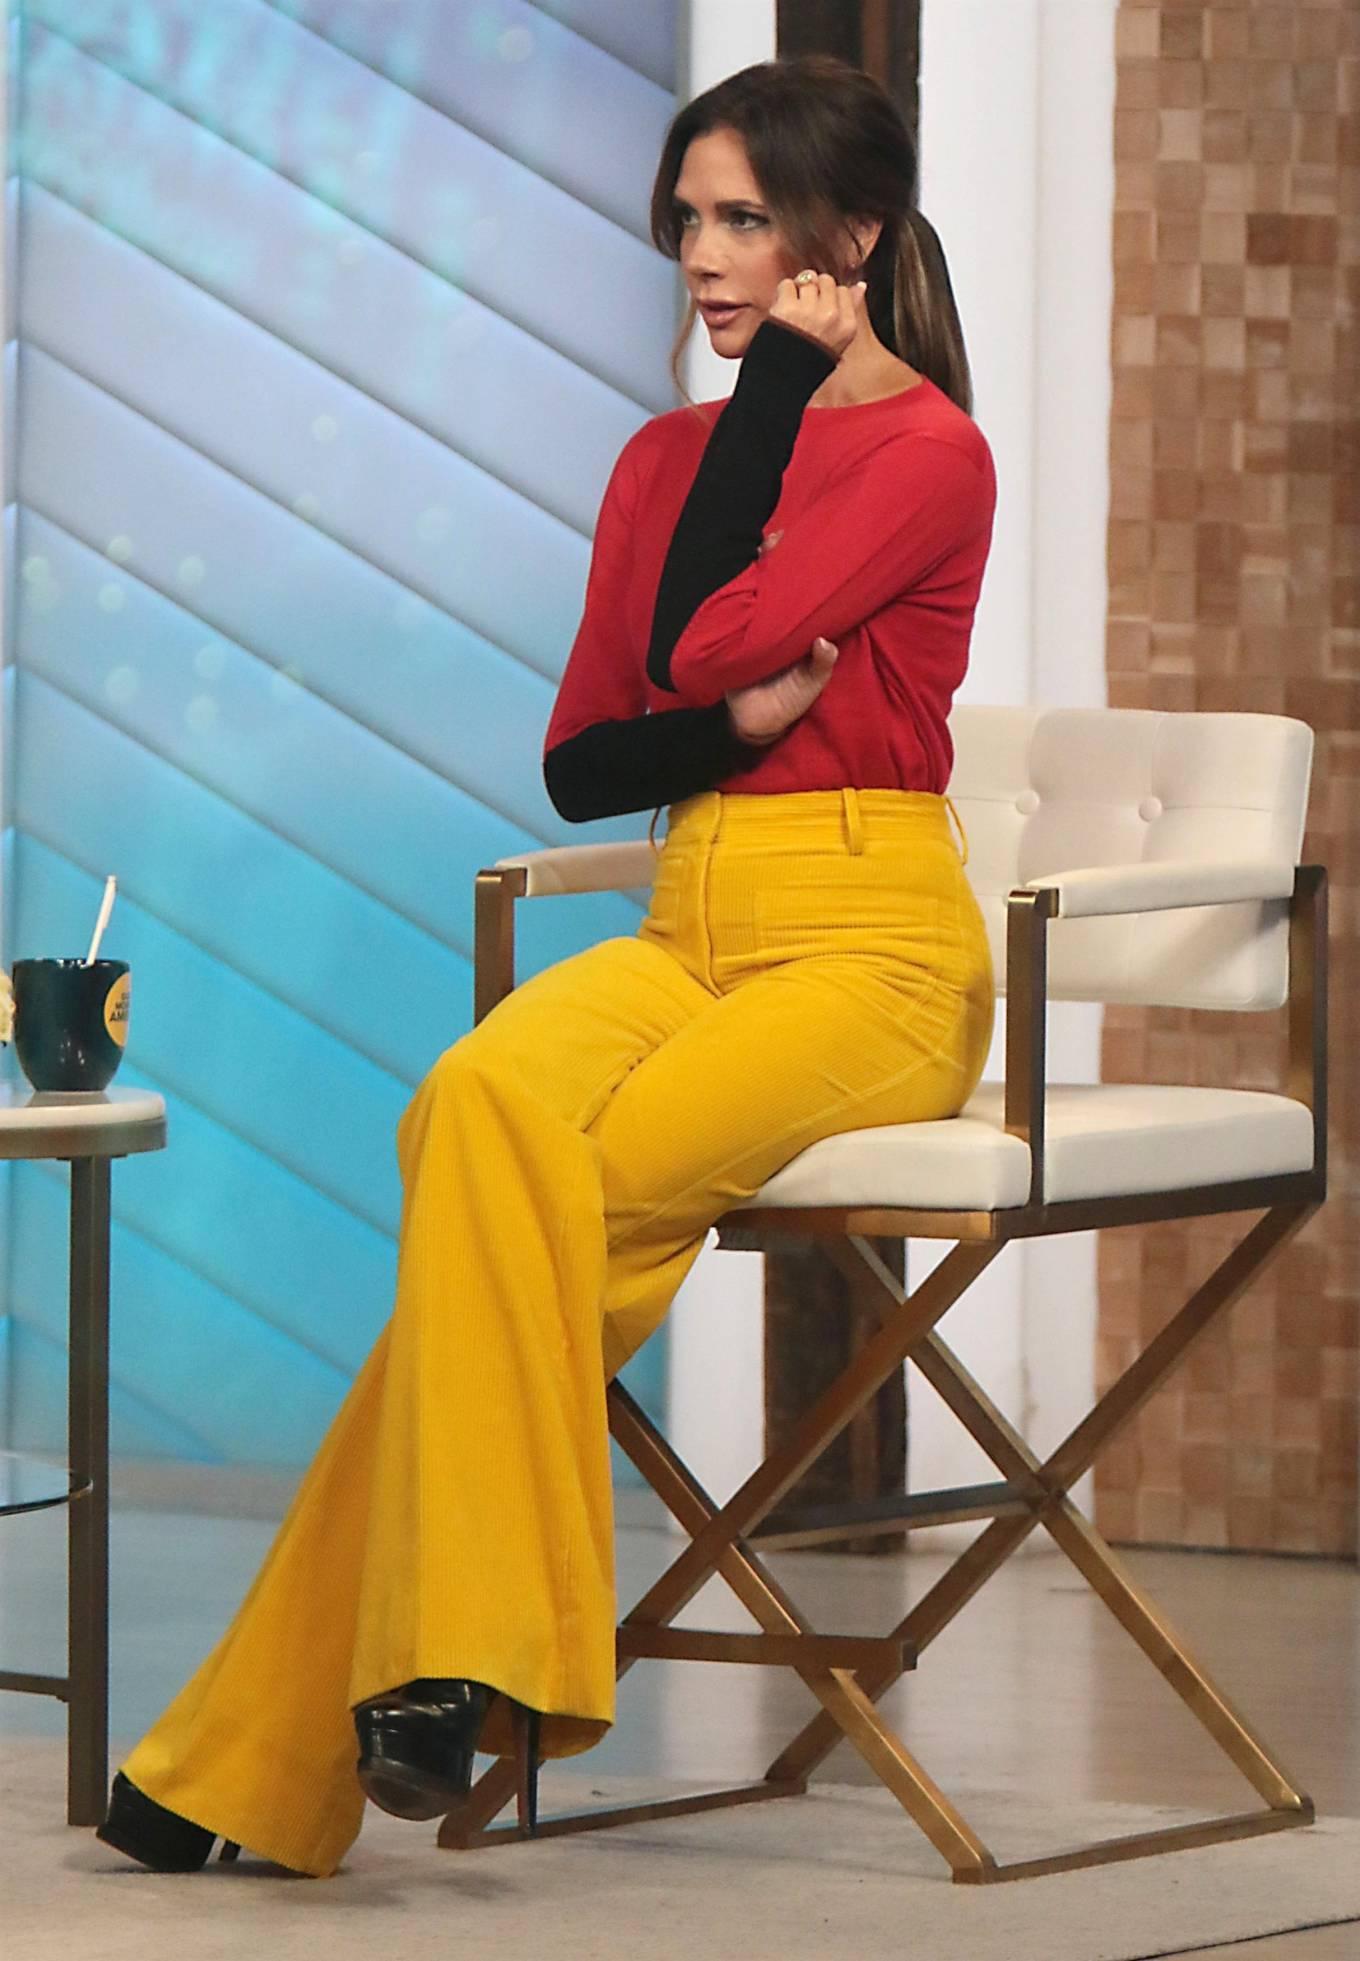 Victoria Beckham 2021 : Victoria Beckham – on Good Morning America promoting her new designer clothing in New York City-06